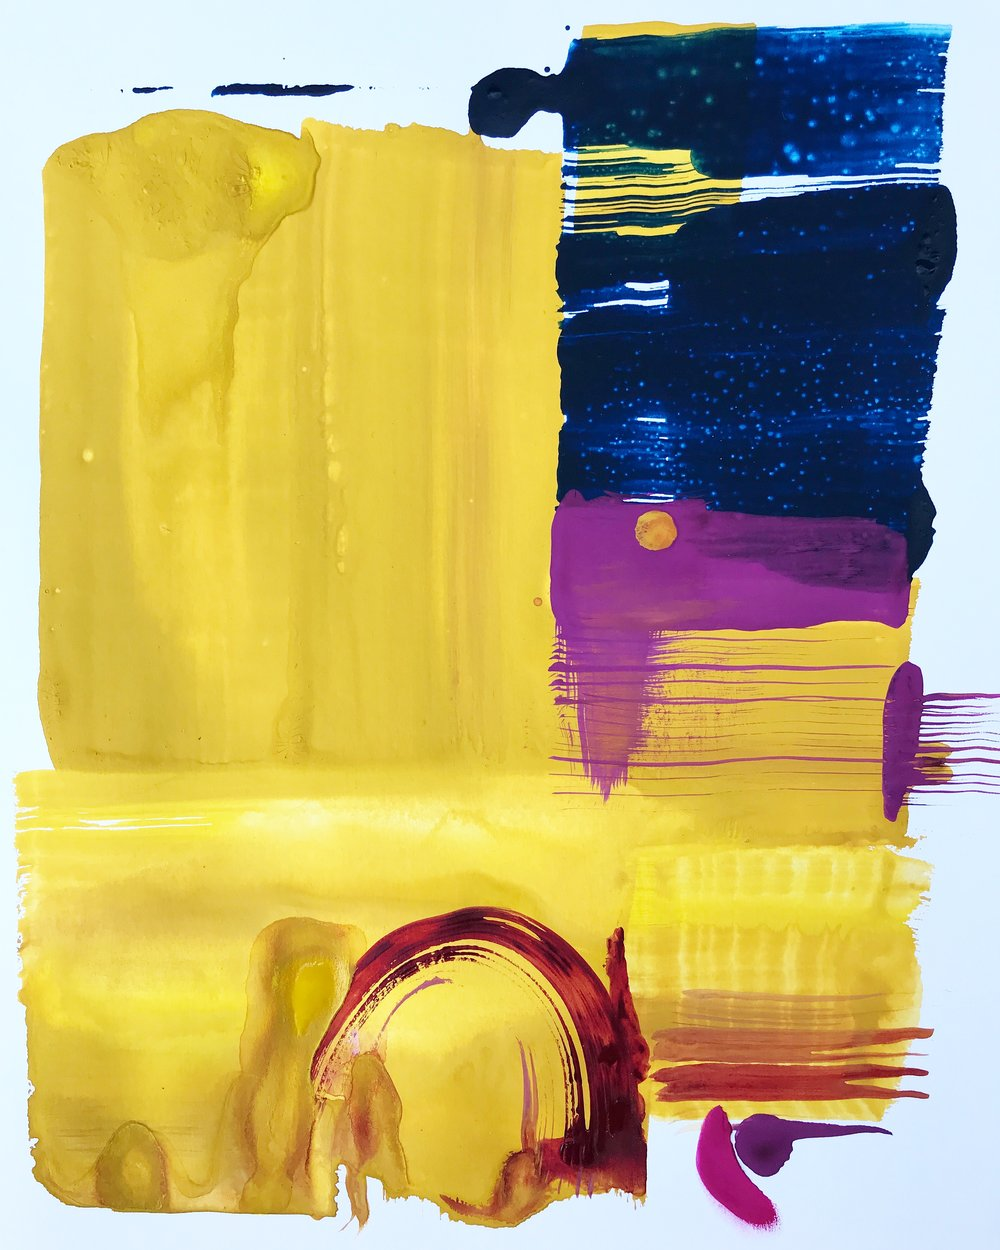 'Cusco',Gouache & Watercolour on Paper,16.5 x 23.4 in